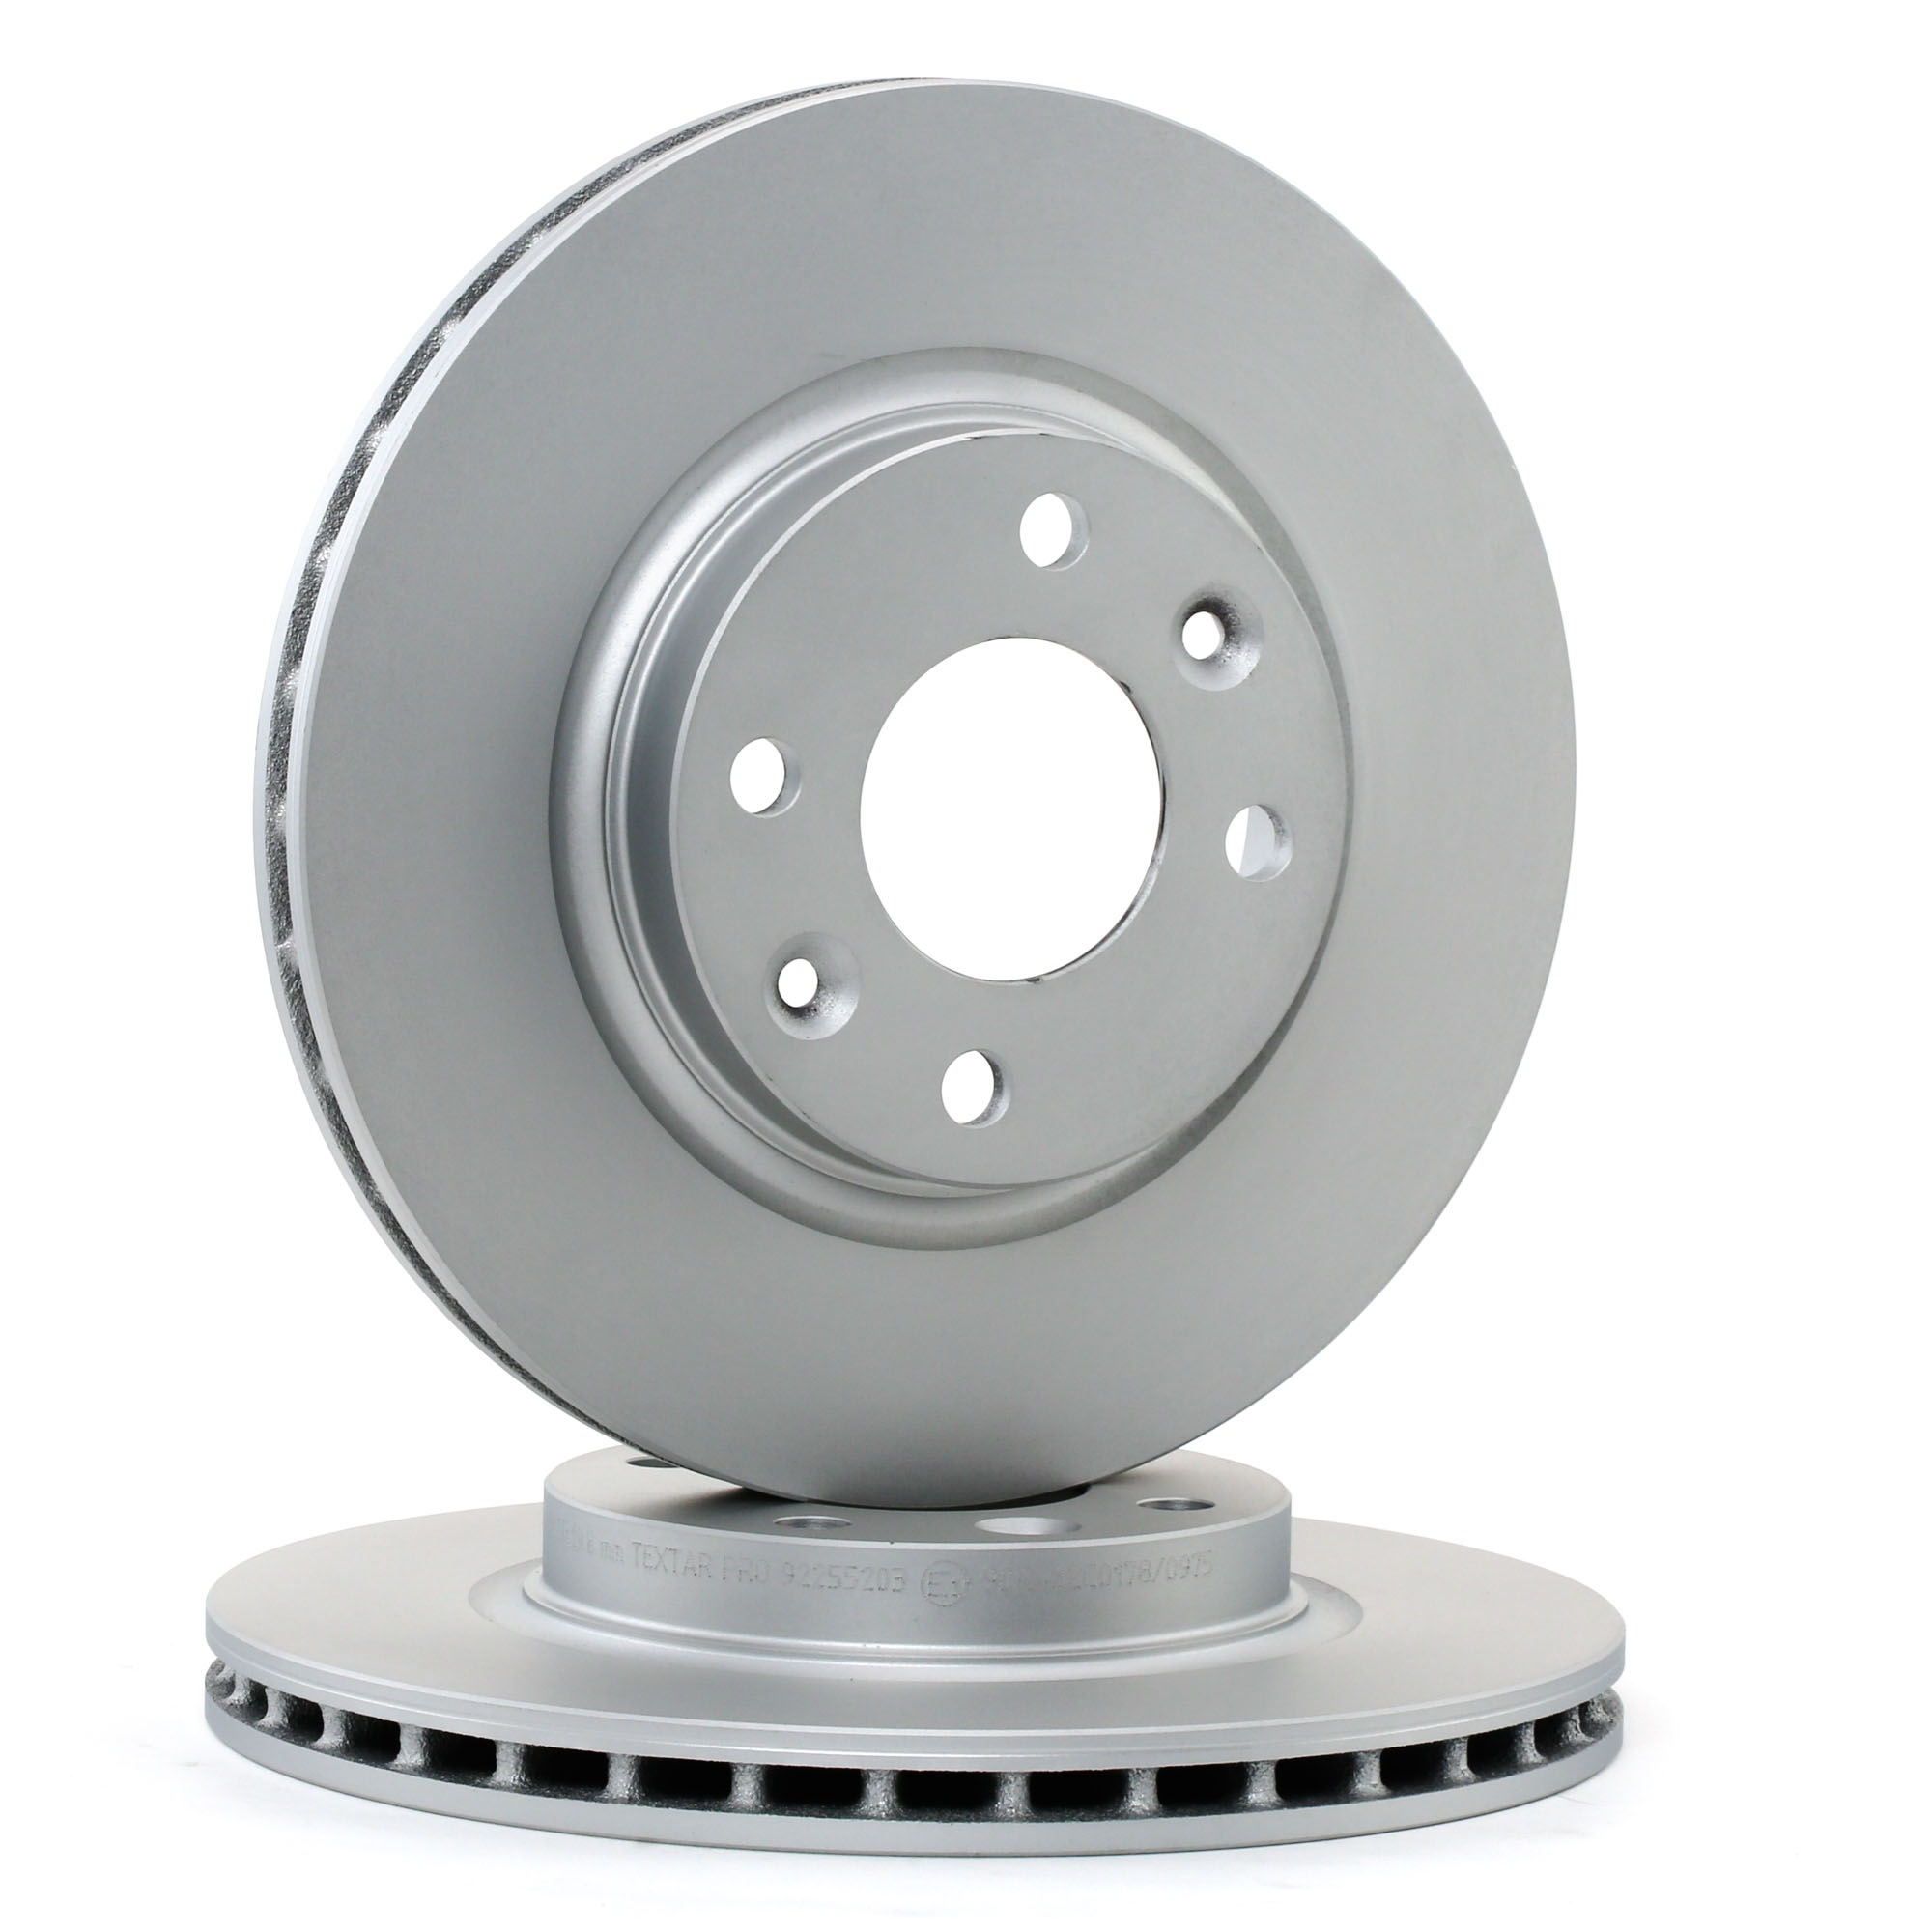 Kit dischi freno 92255203 TEXTAR — Solo ricambi nuovi